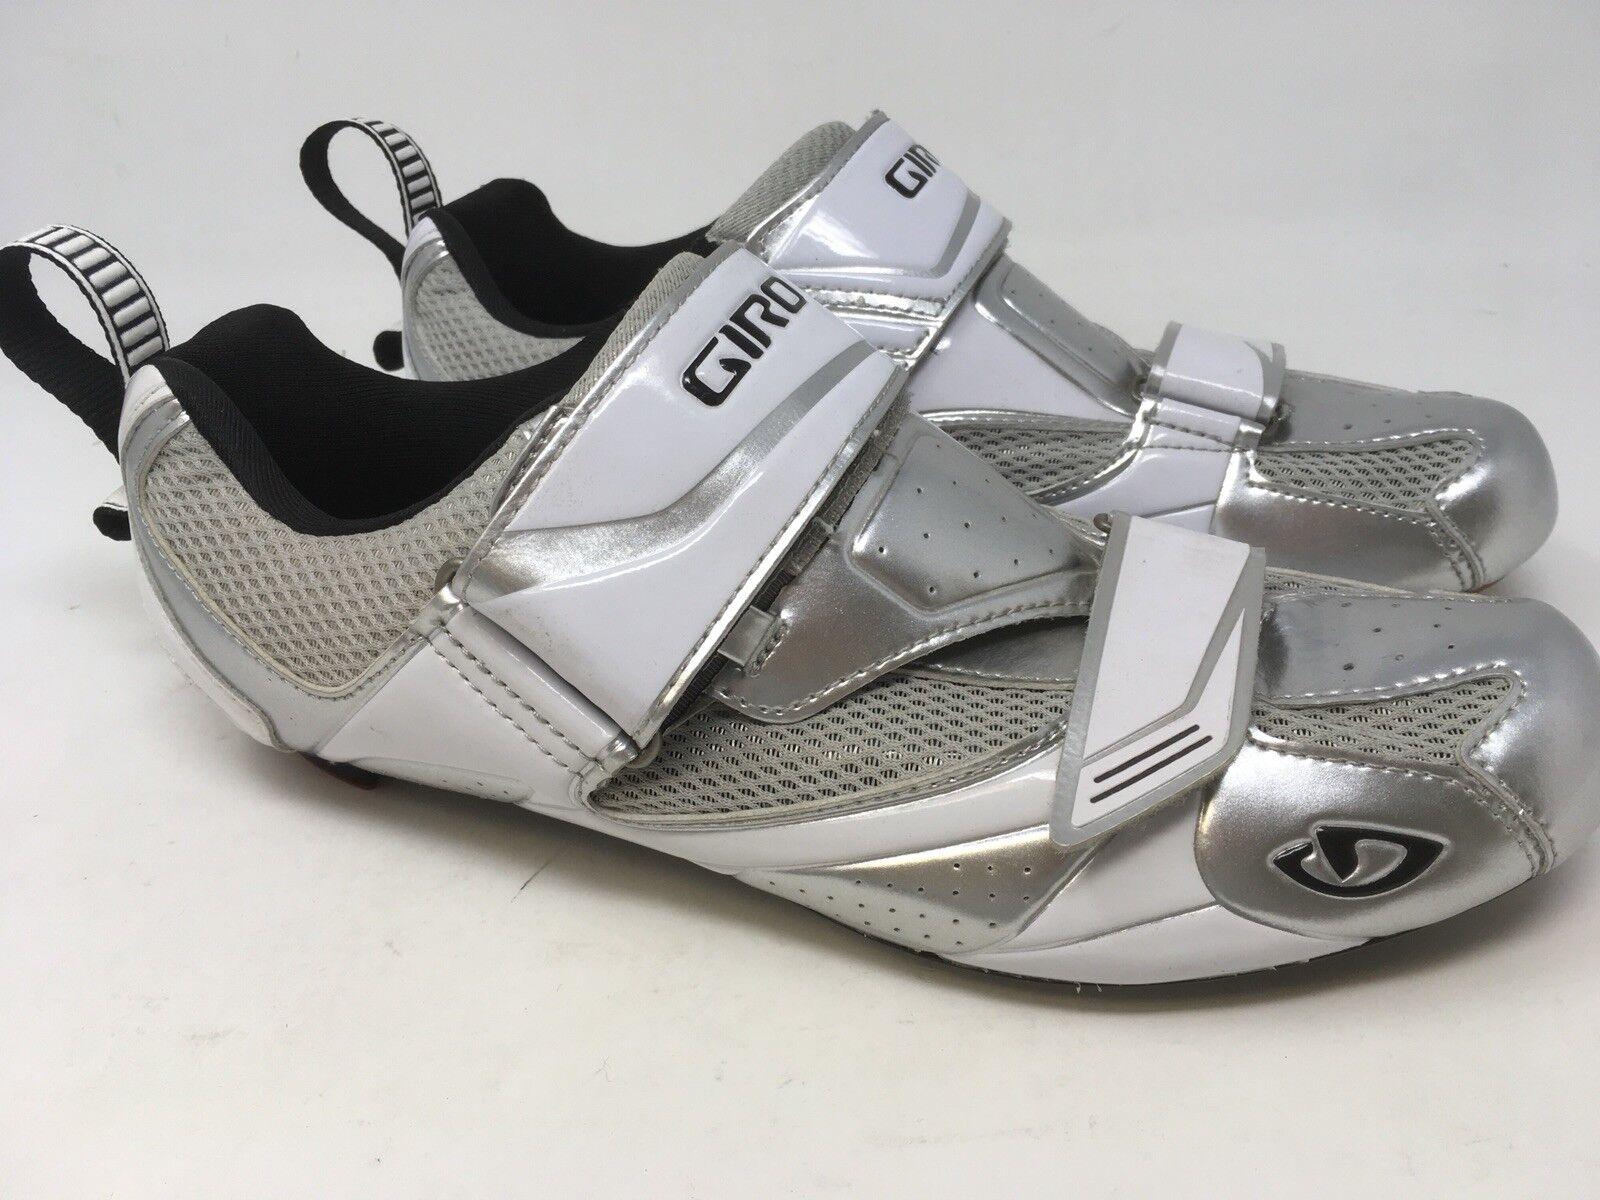 NEW GIRO MELE Men's Tri Triathlon  US 9.25 Carbon shoes